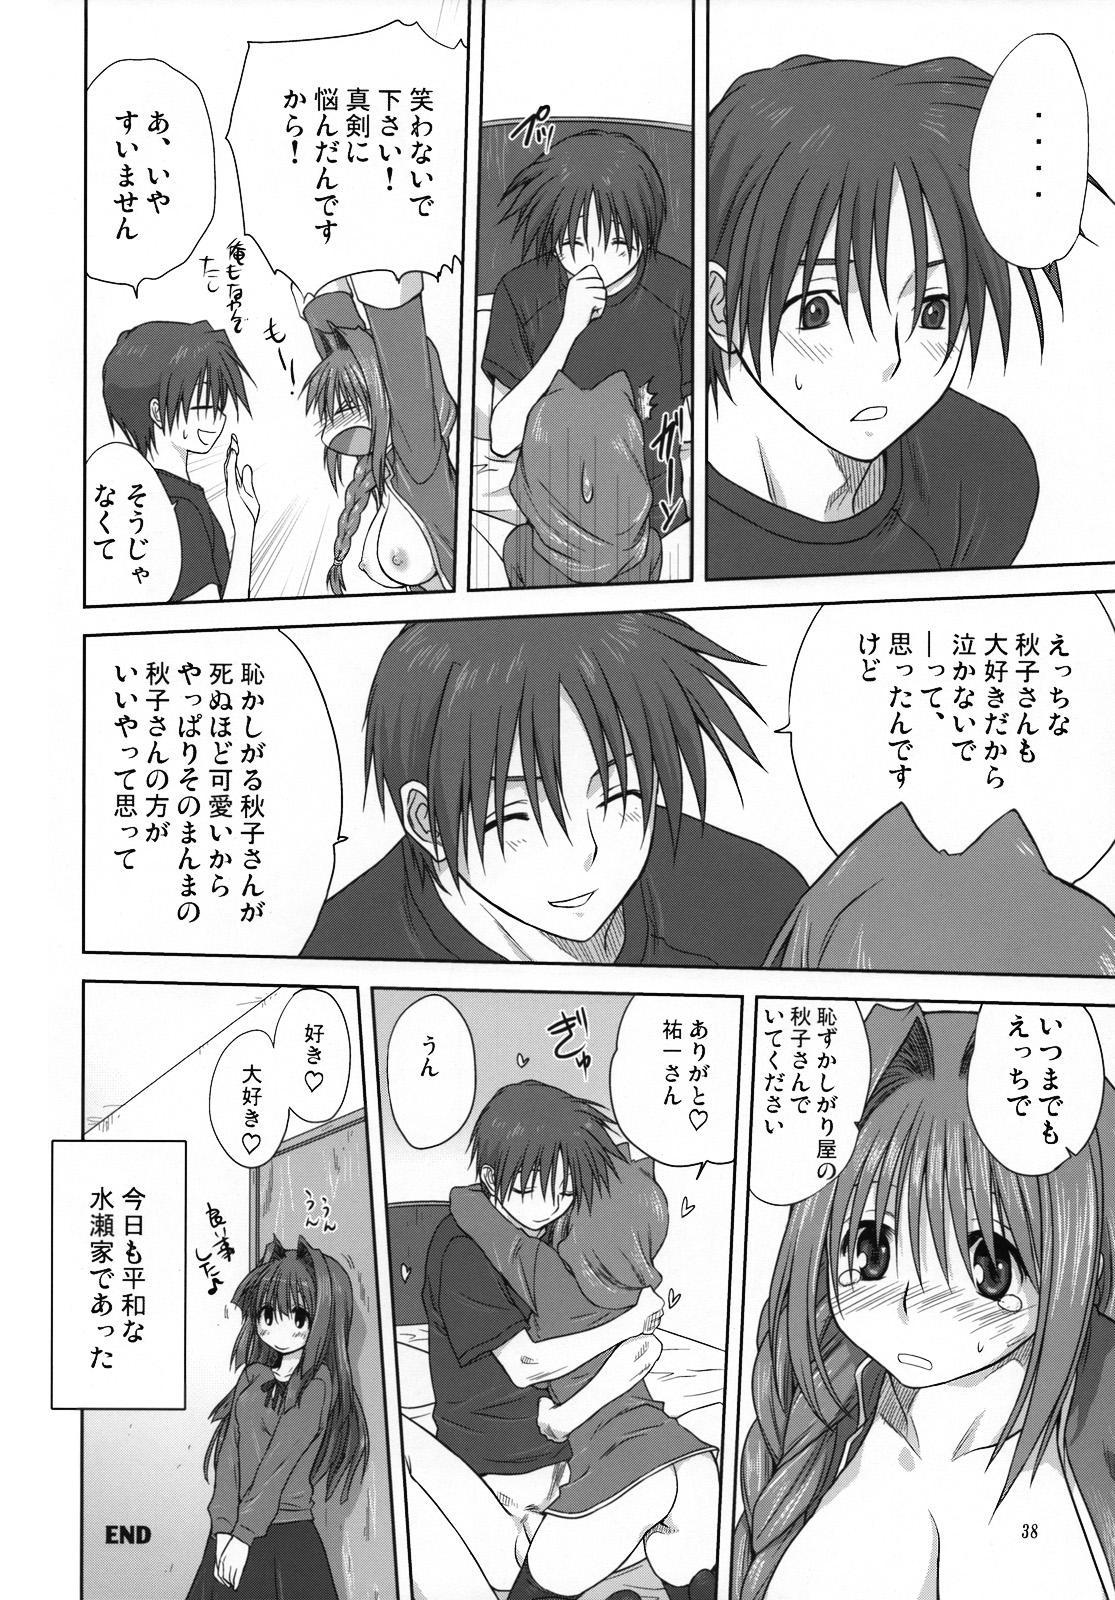 Akiko-san to Issho 3 36